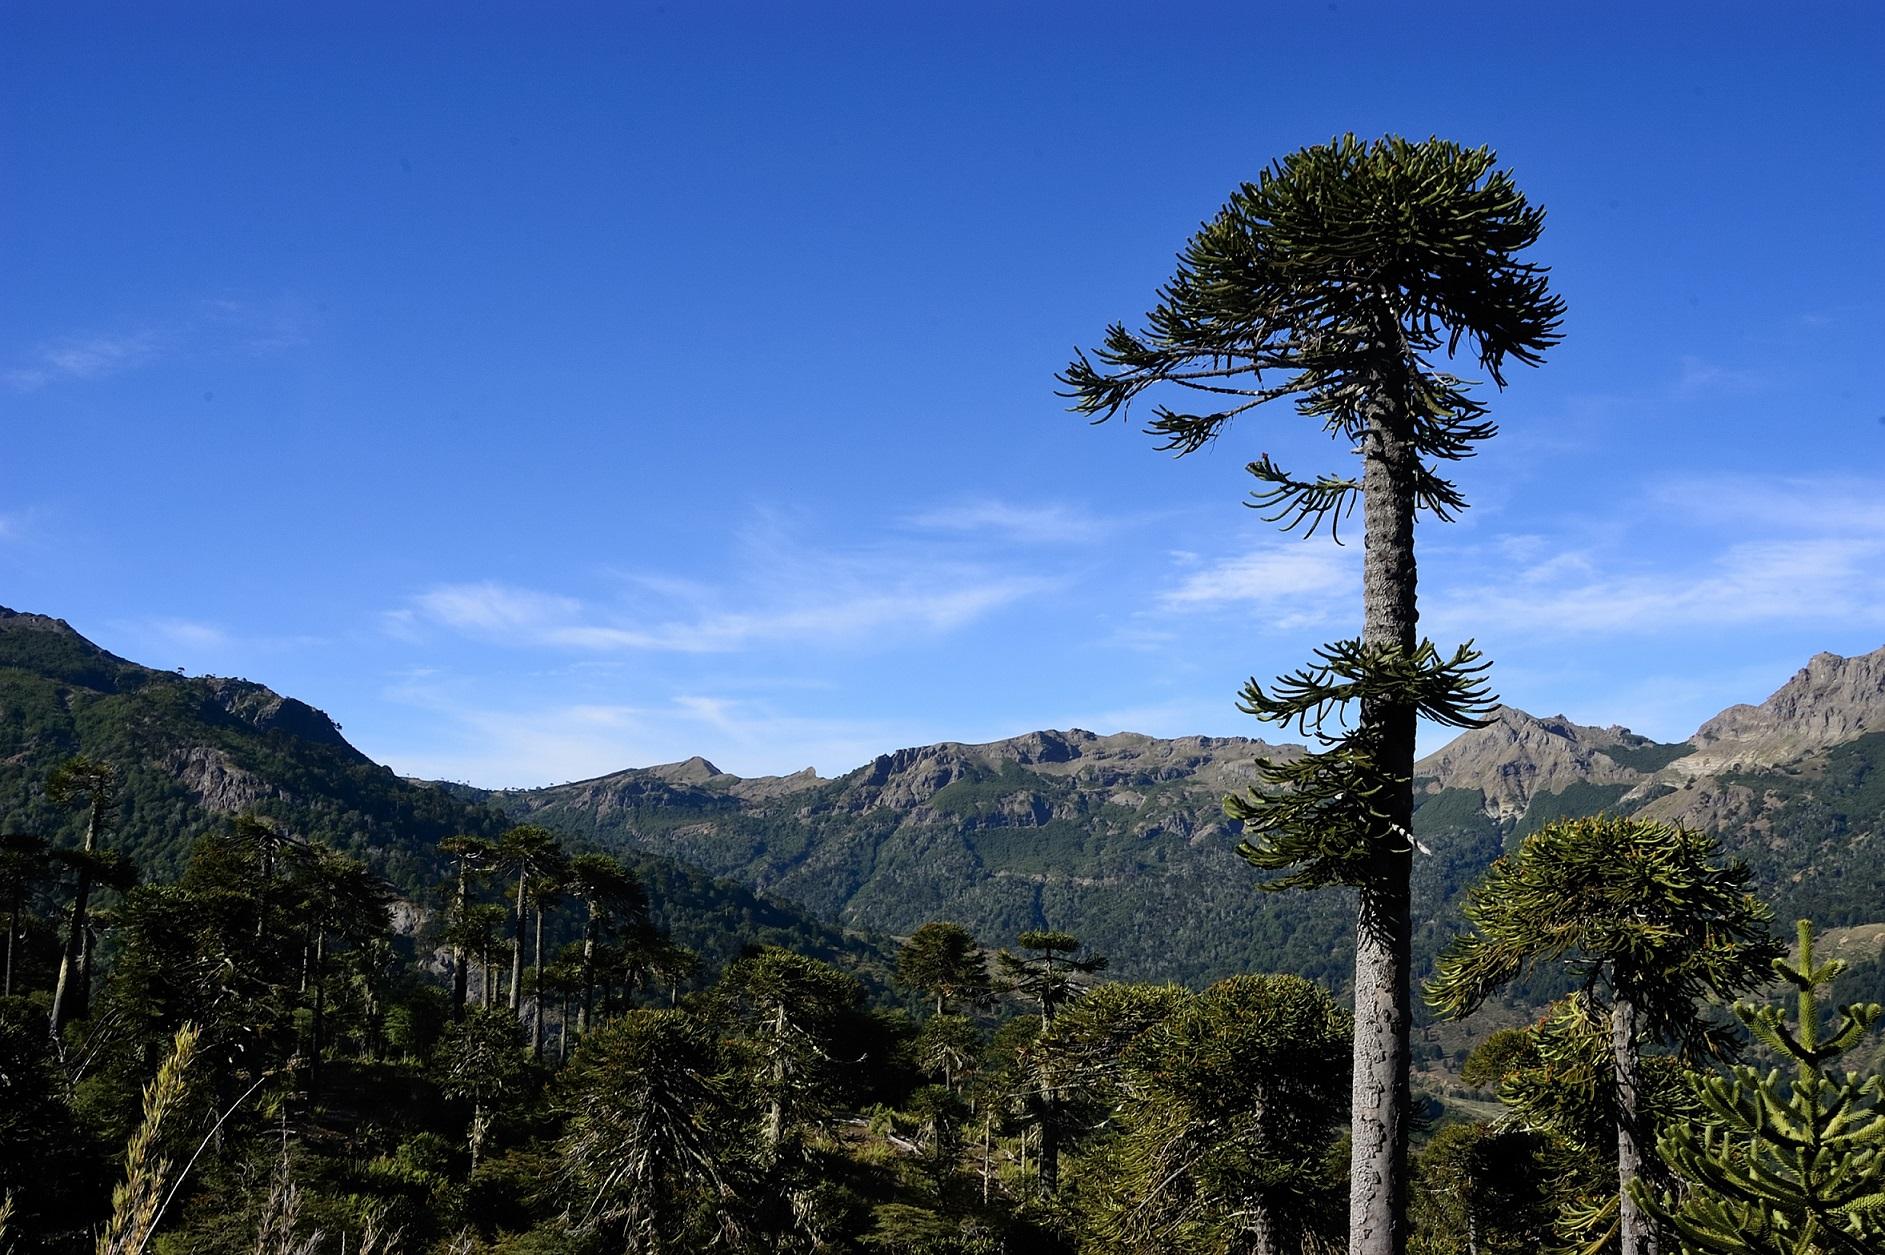 Foto de araucaria rodeada de bosque